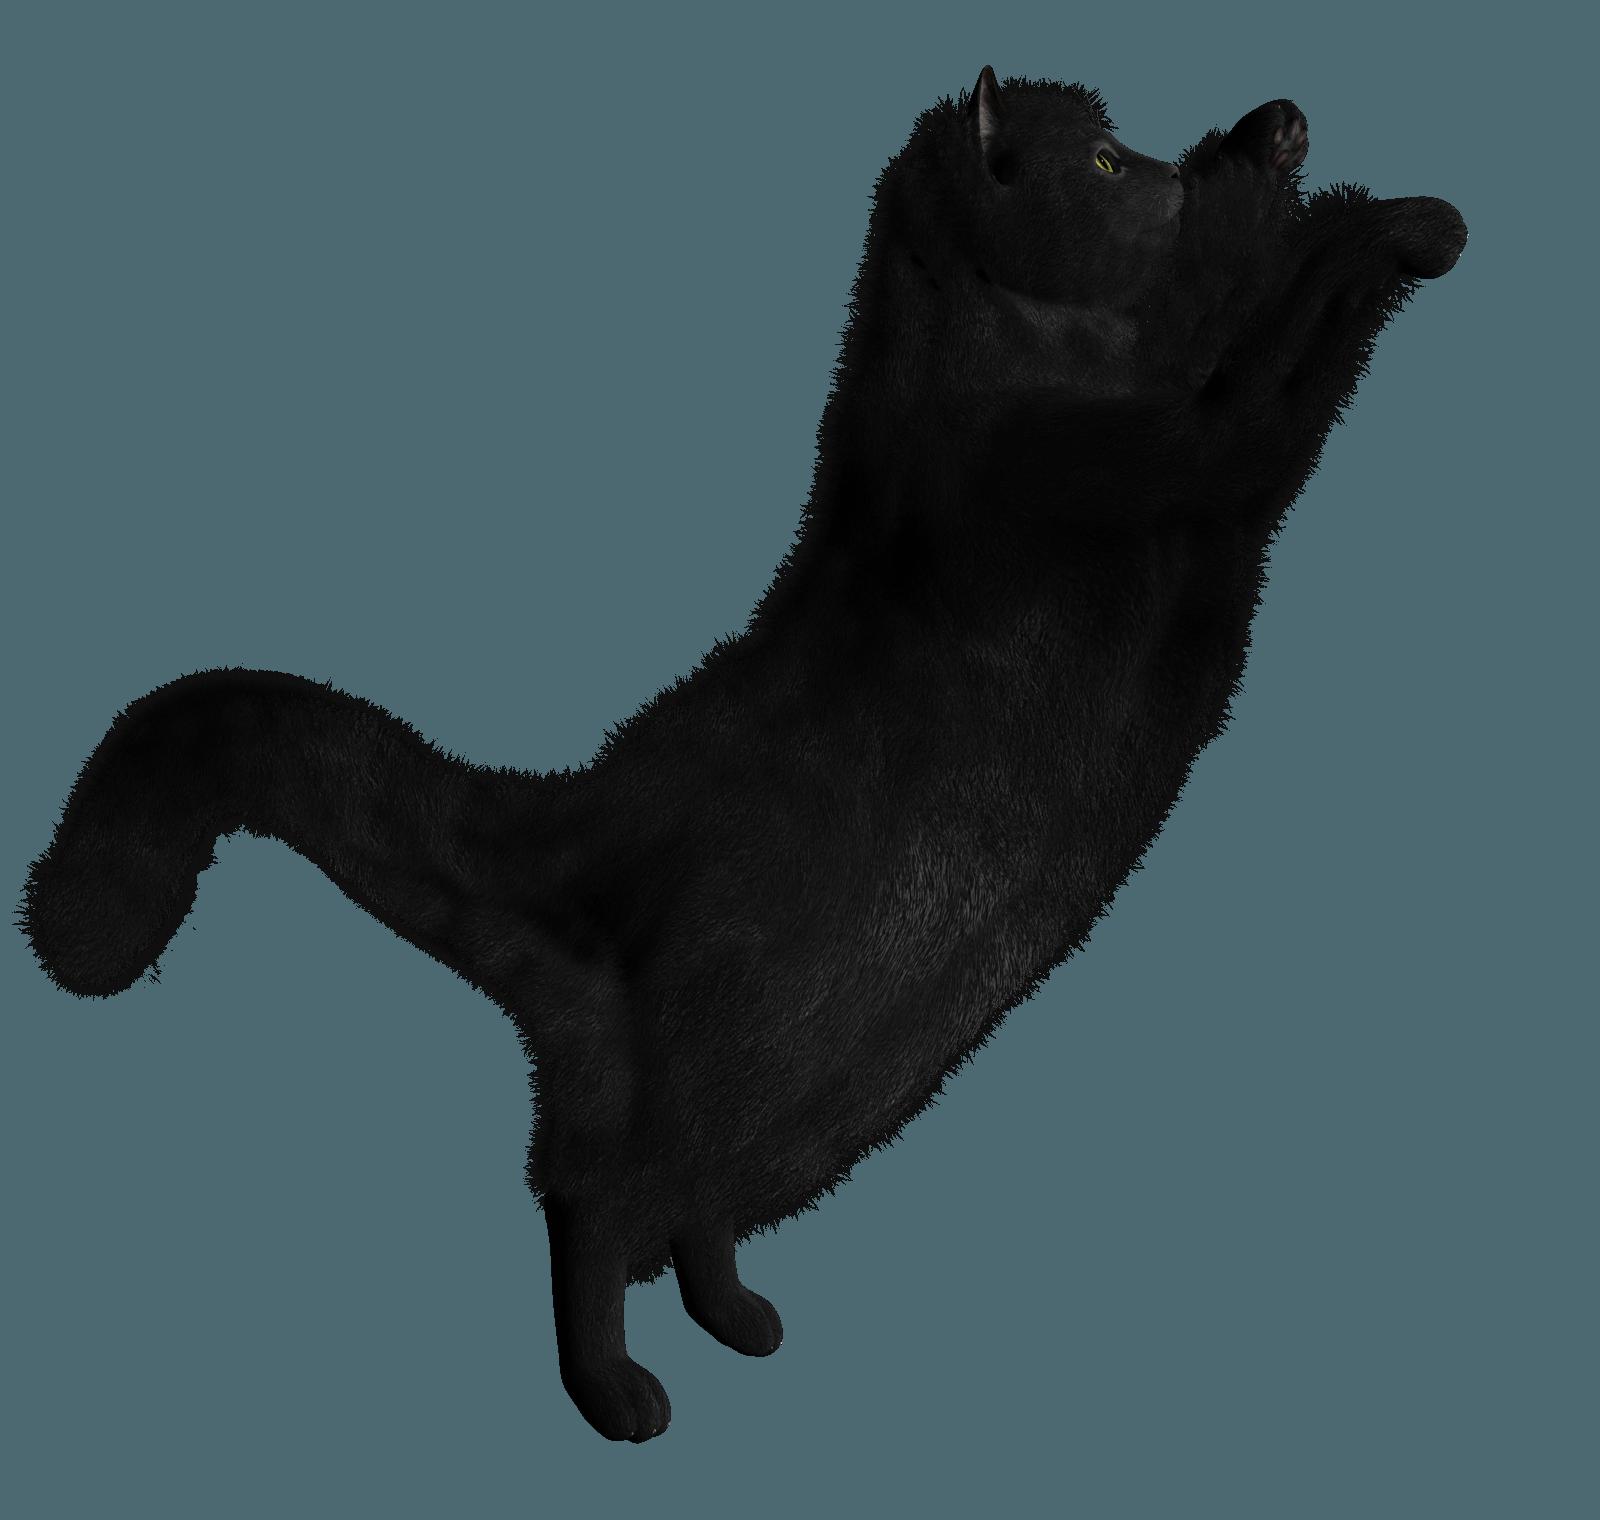 Download Black Cat Png Image HQ PNG Image | FreePNGImg